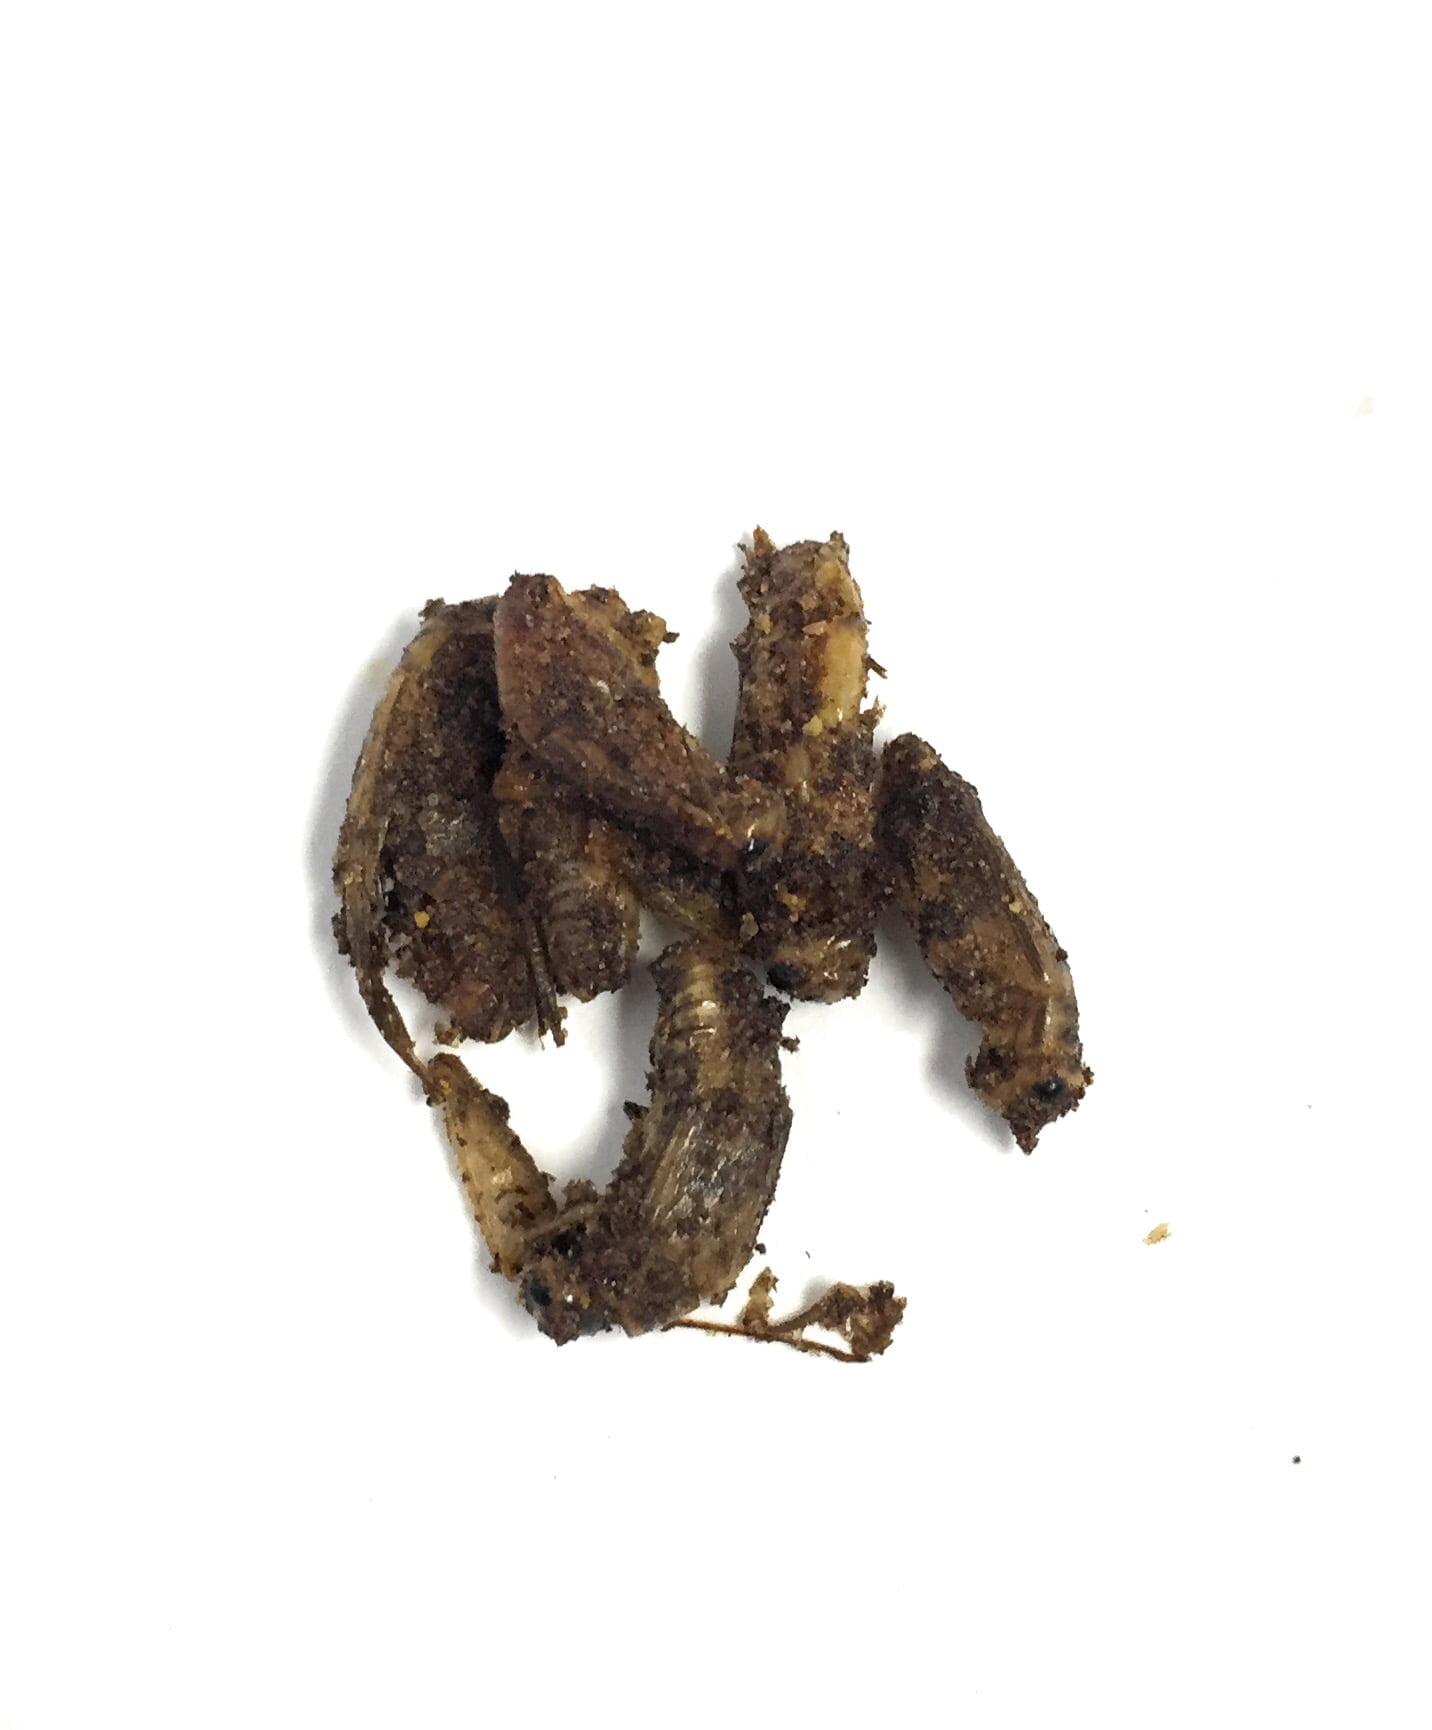 Chili Powder Crickets